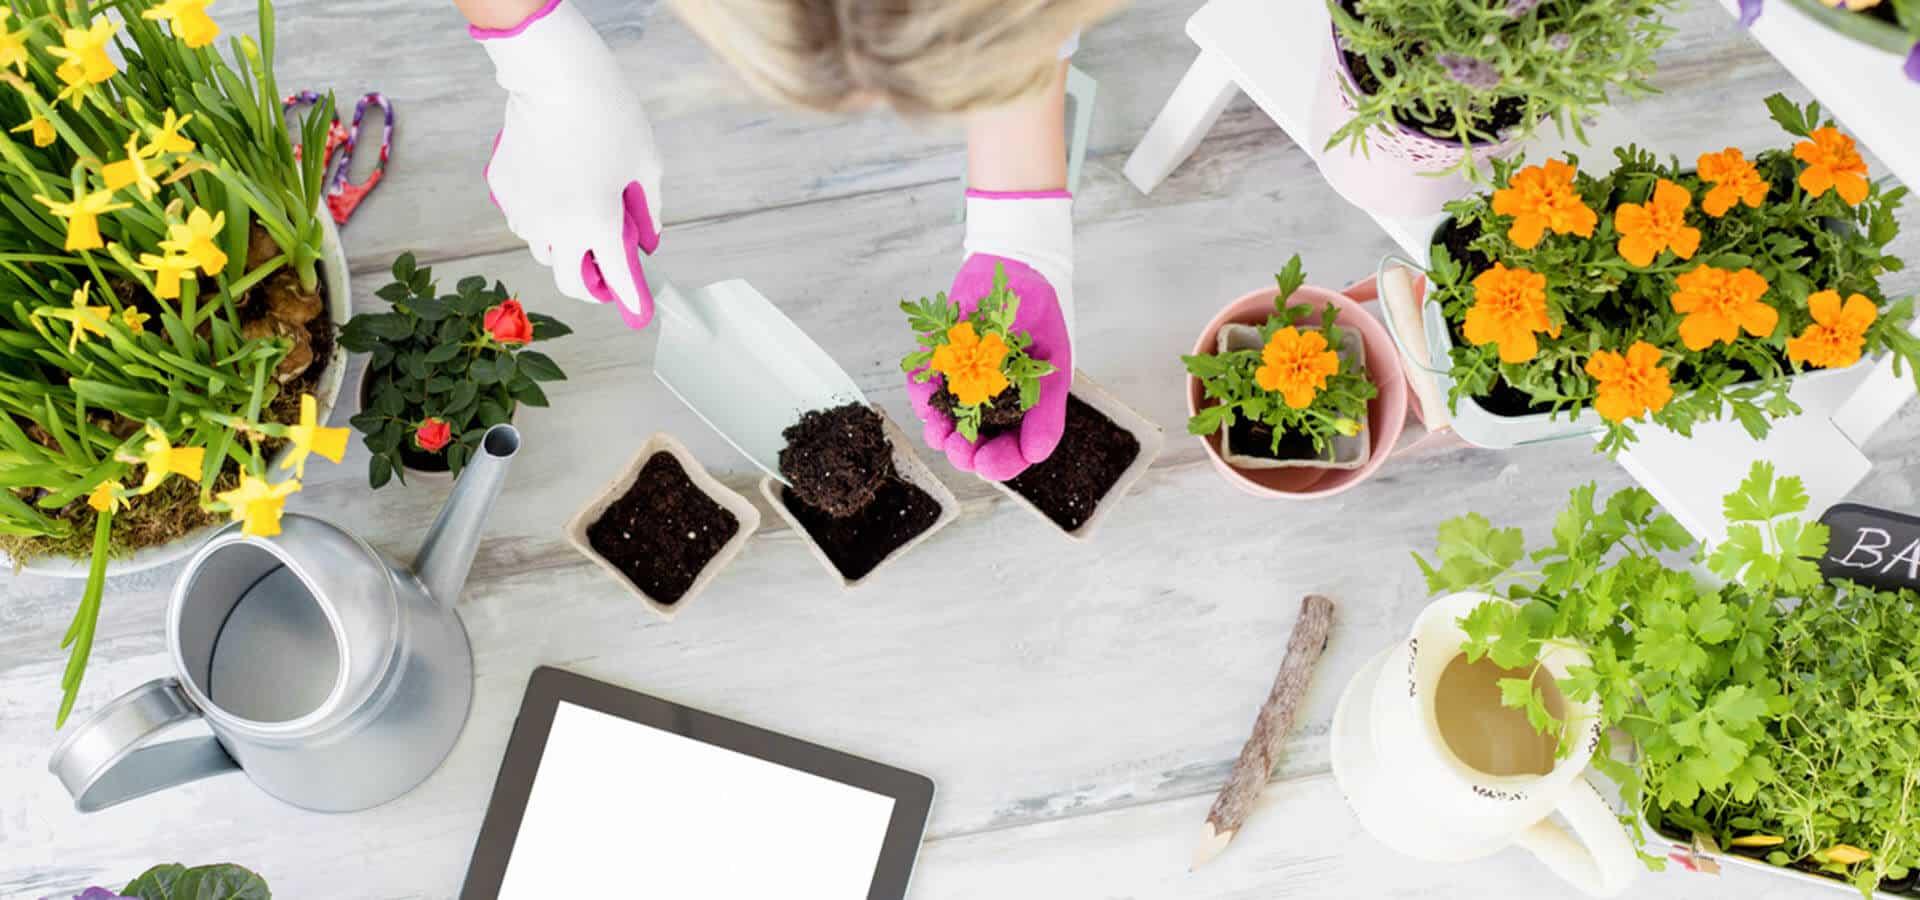 jardinagebricolage slide1 fullcontent